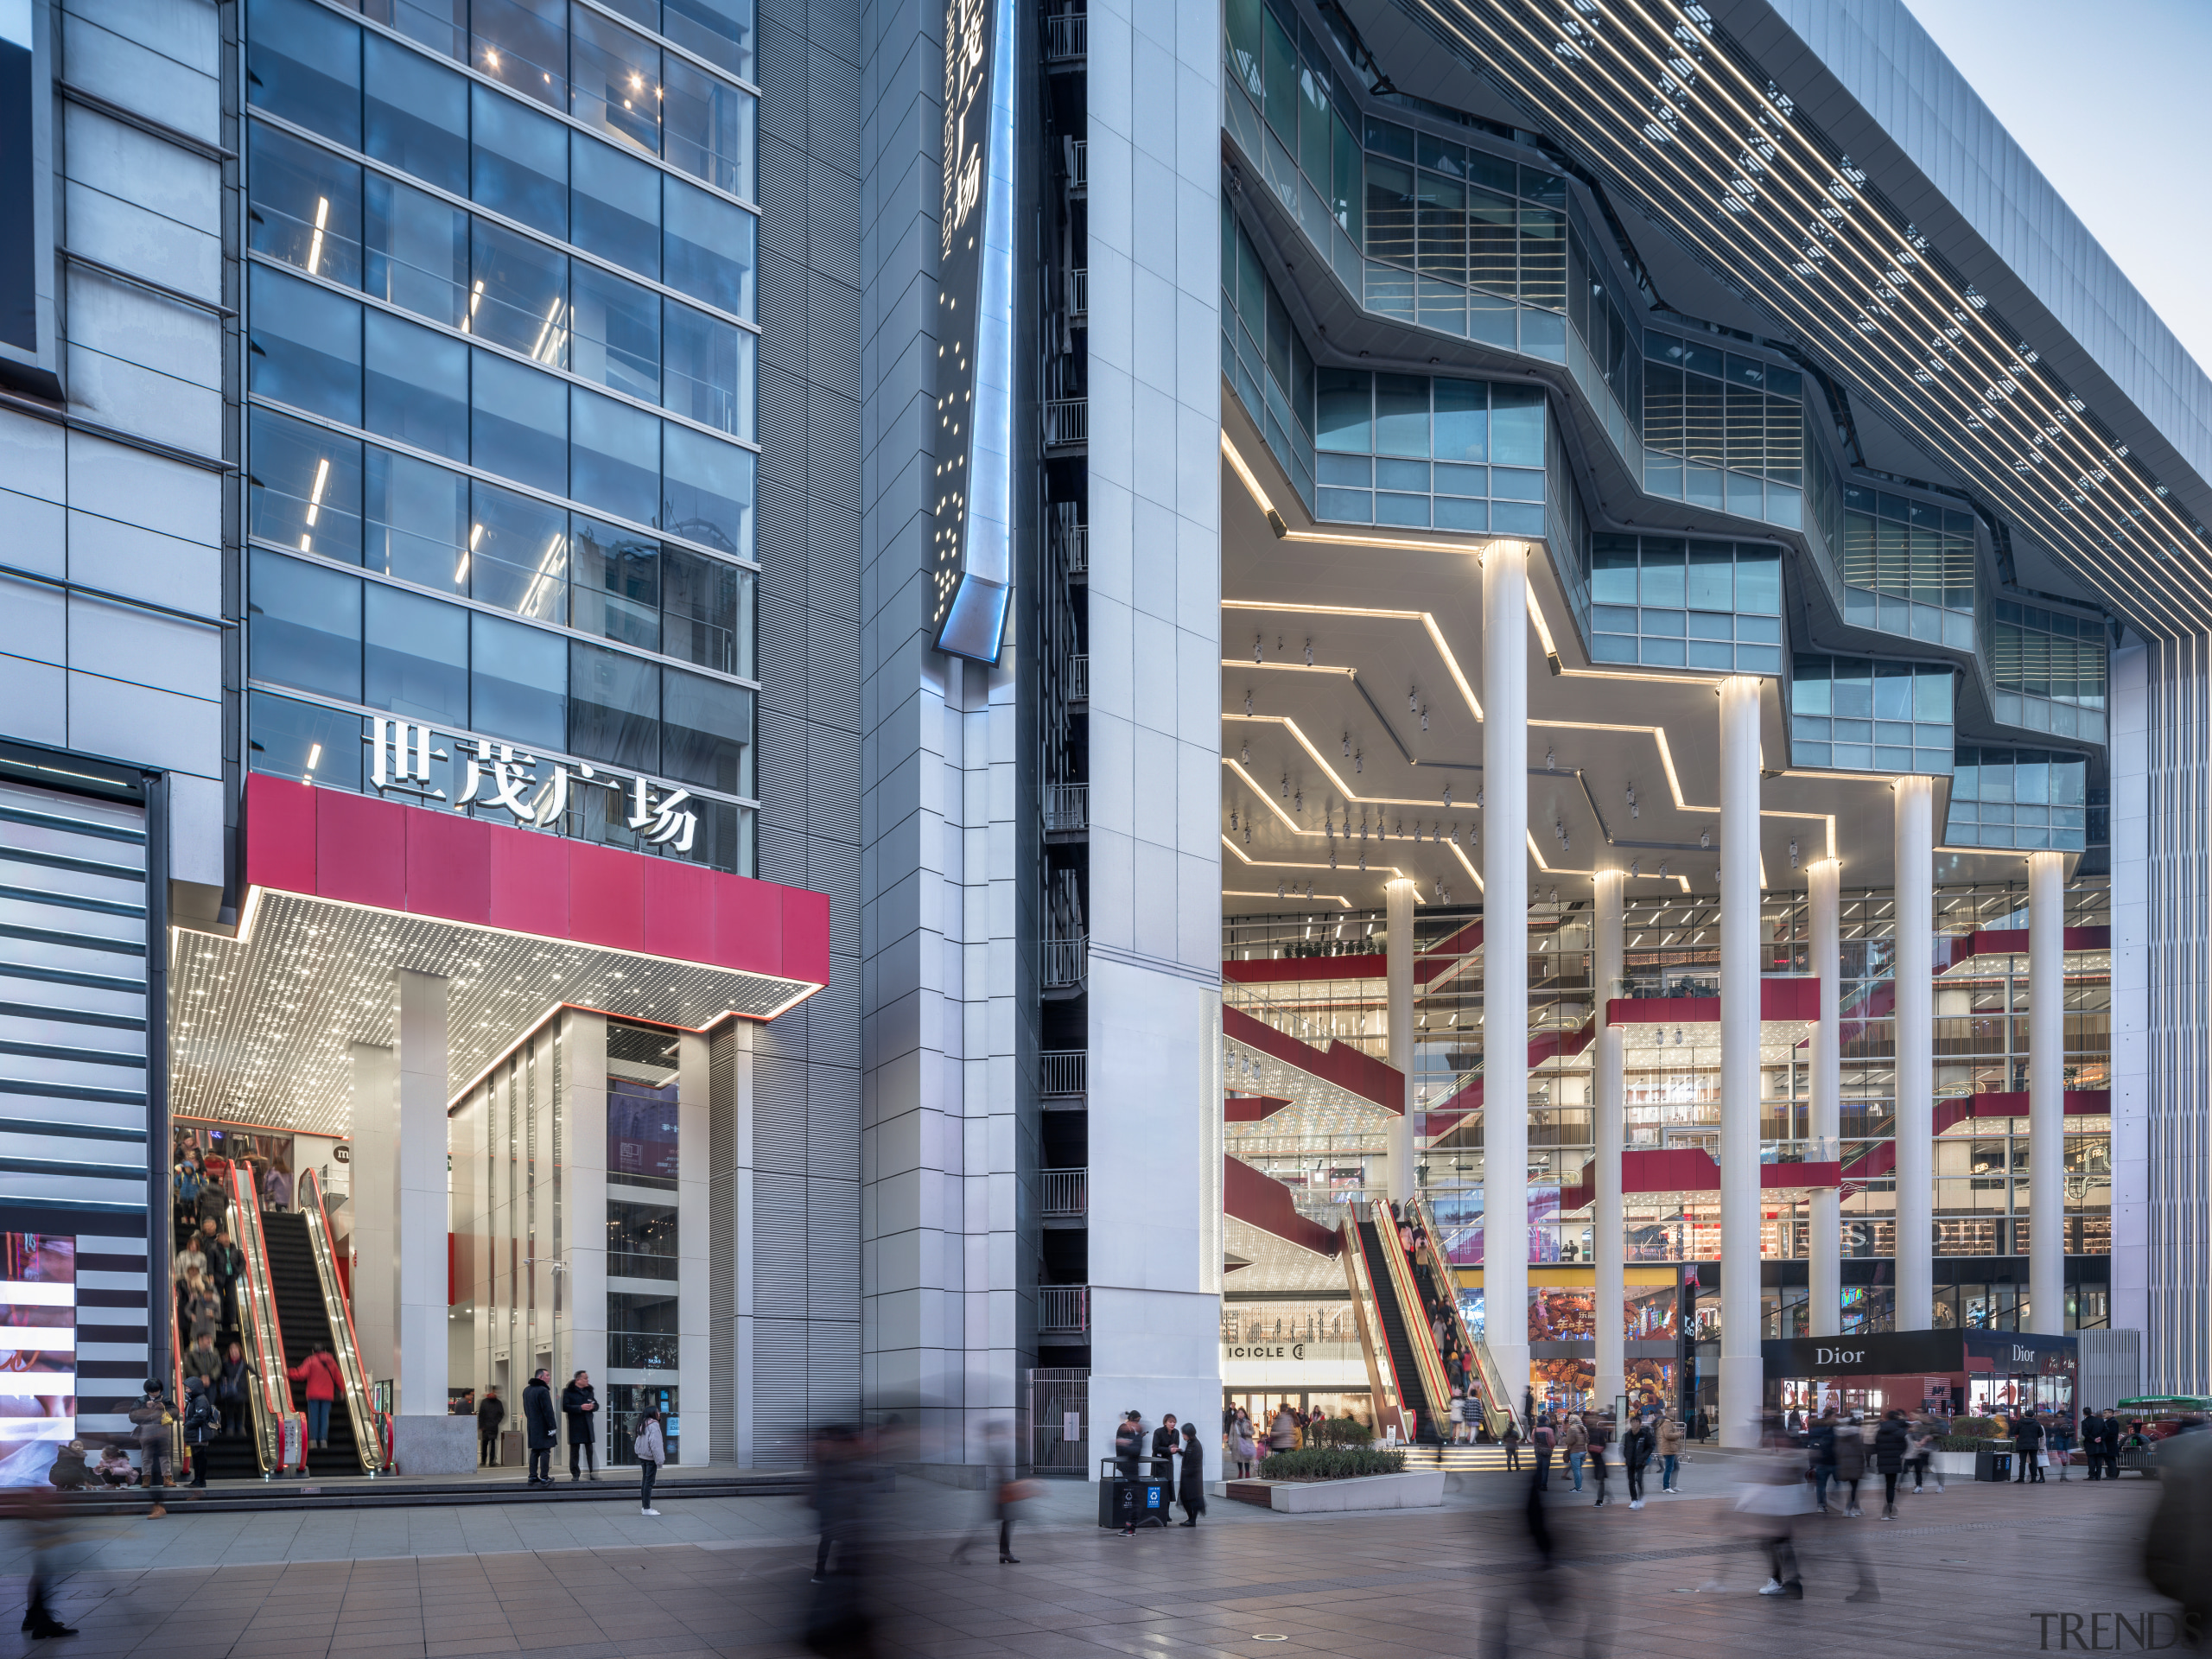 Red balustrading on the Shimao Festival City mall's architecture, building, city, commercial building, balustrading, exterior facade, Kokaistudios